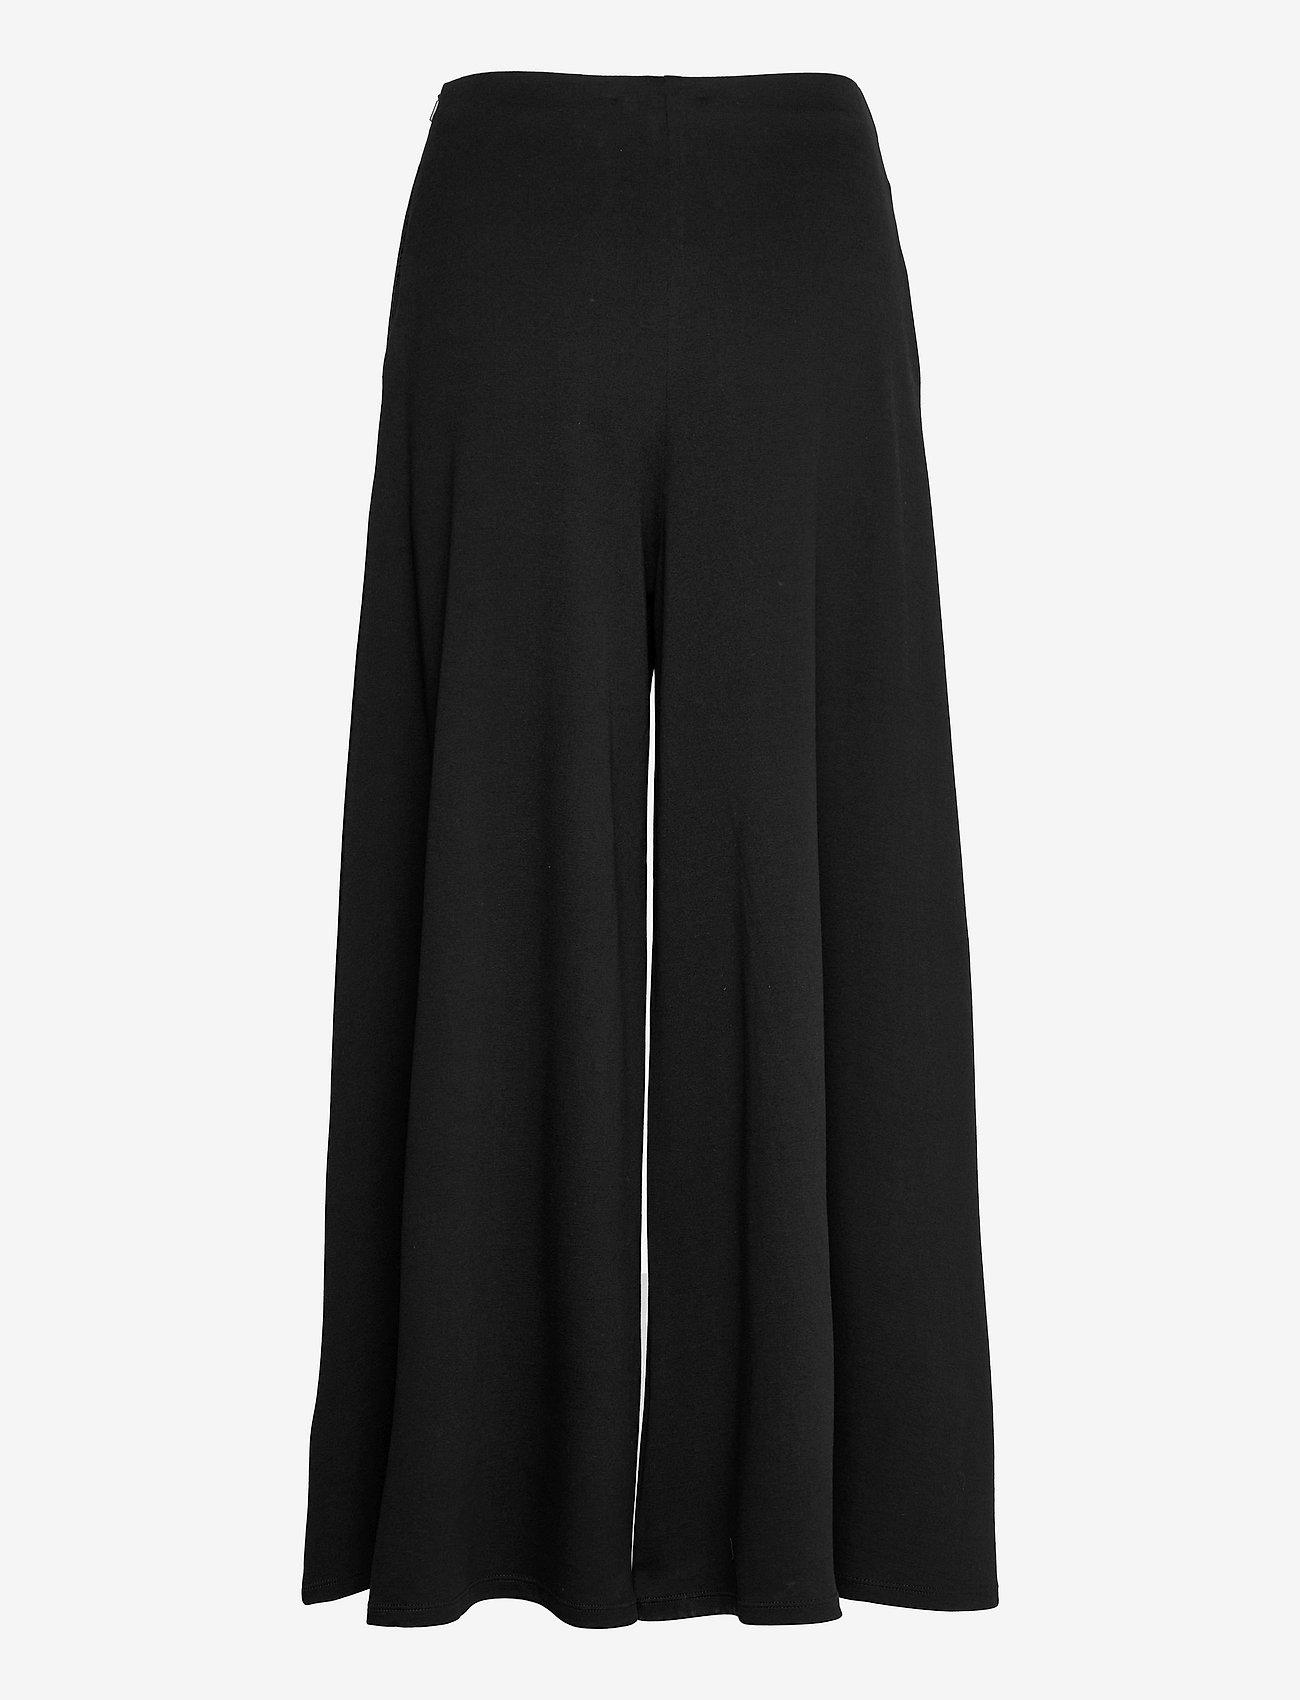 Max Mara Leisure - ESPERIA - wide leg trousers - black - 1